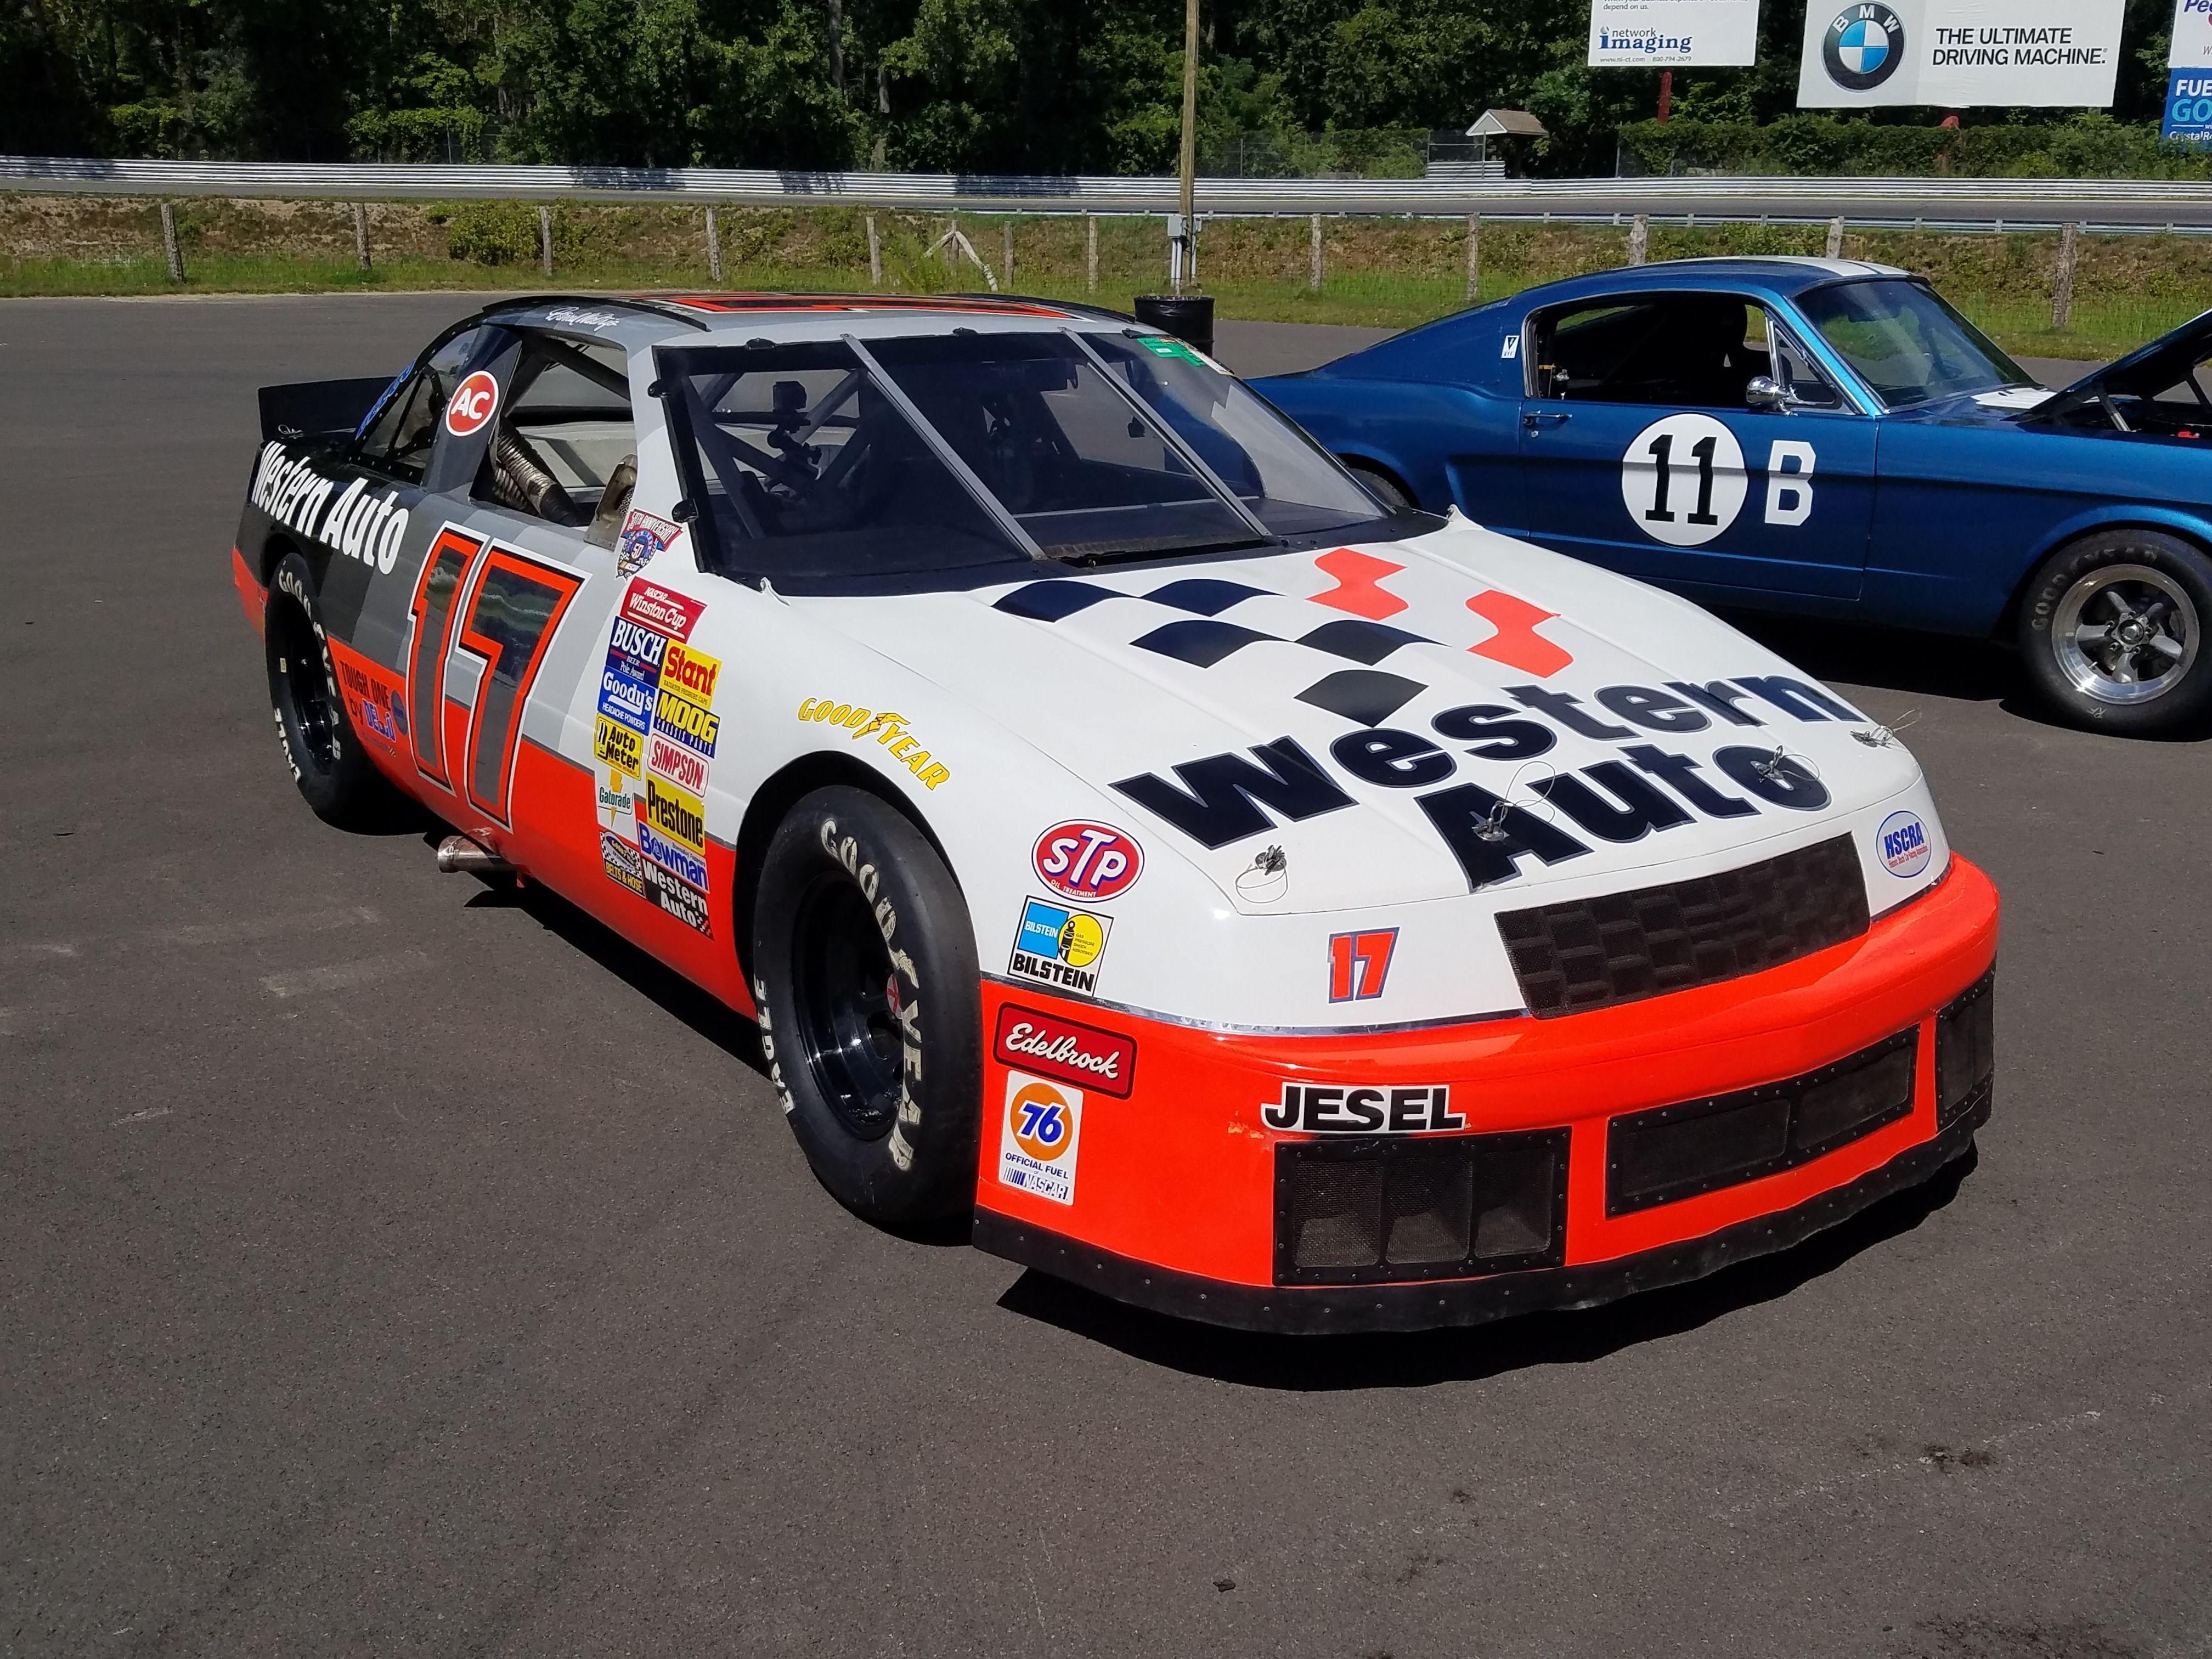 1991 Waltrip Lumina vintage NASCAR at Lime Rock Park (summer 2016 ...